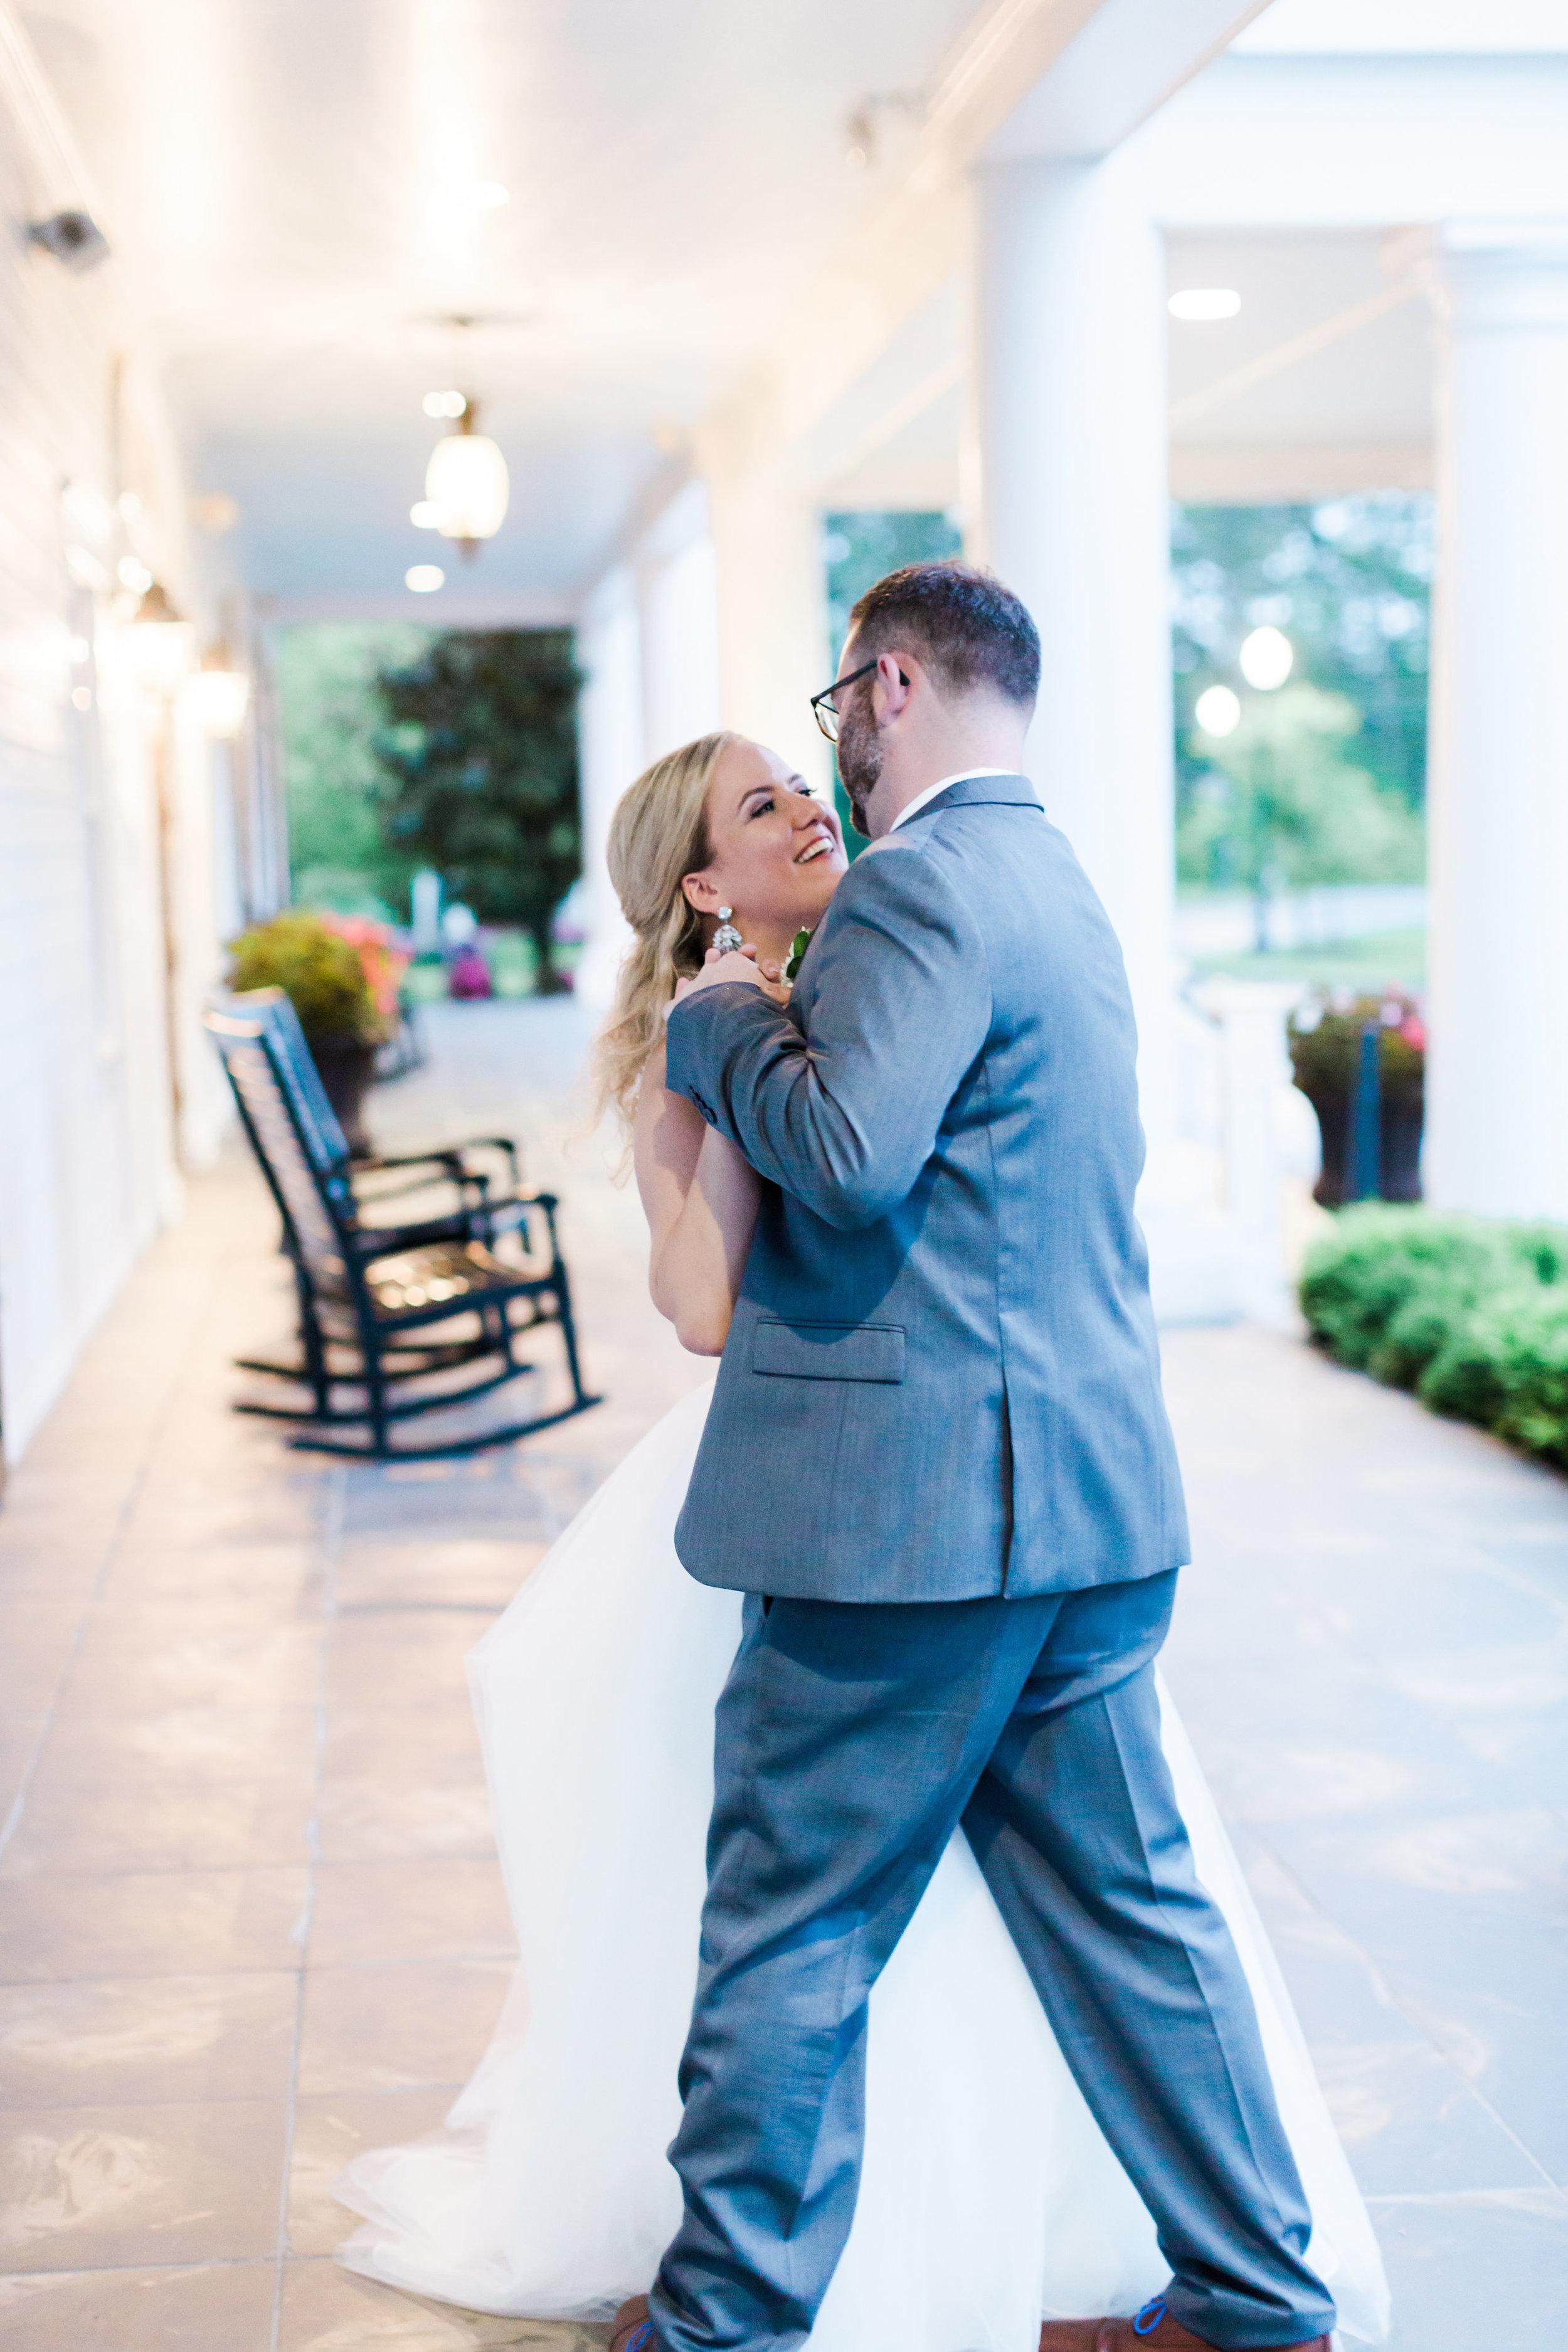 caitlin elizabeth james-elizabeth friske photography-selecting a wedding venue1